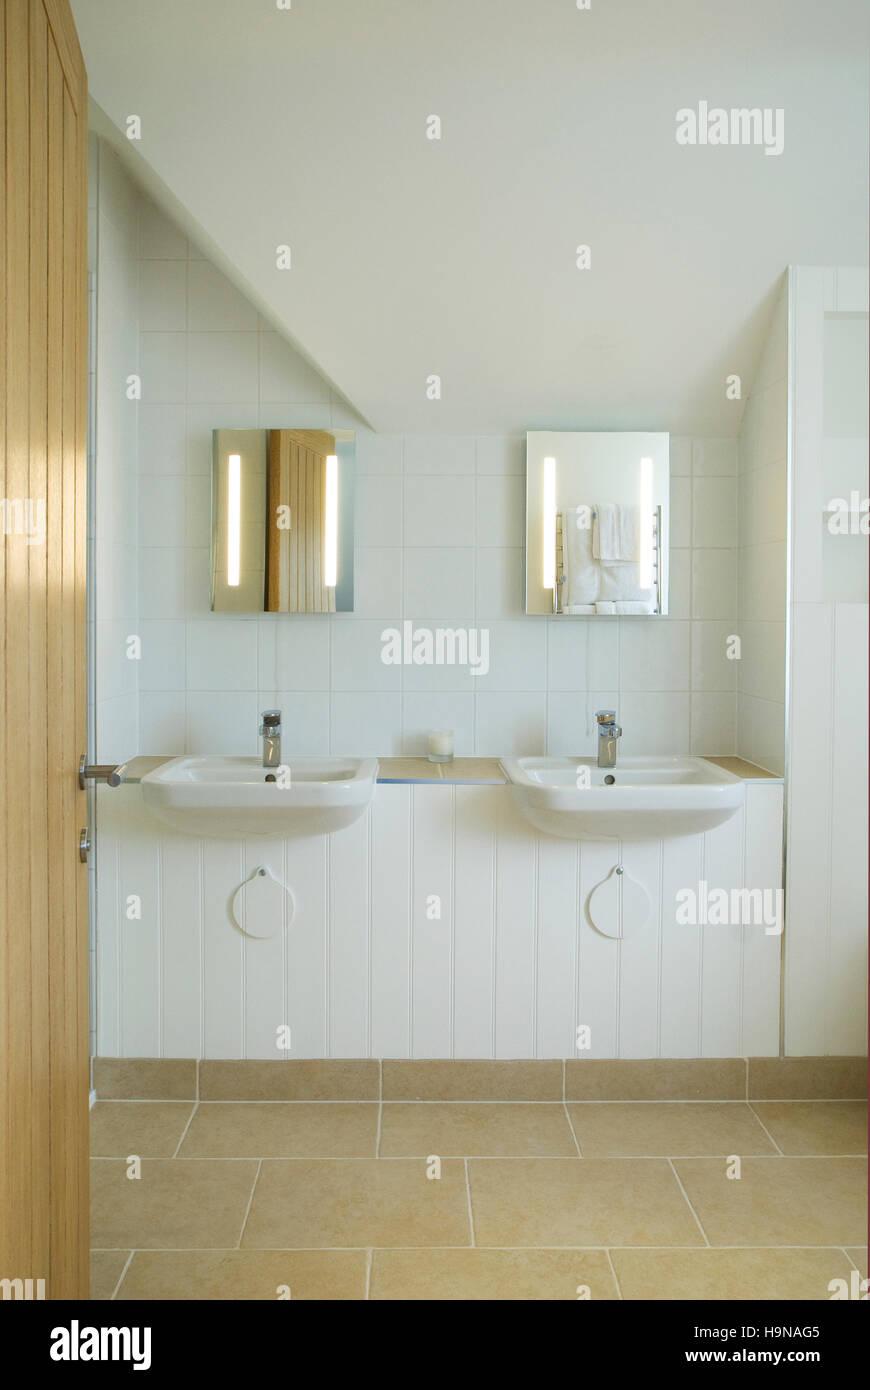 Matching Mirrors Stock Photos & Matching Mirrors Stock Images - Alamy